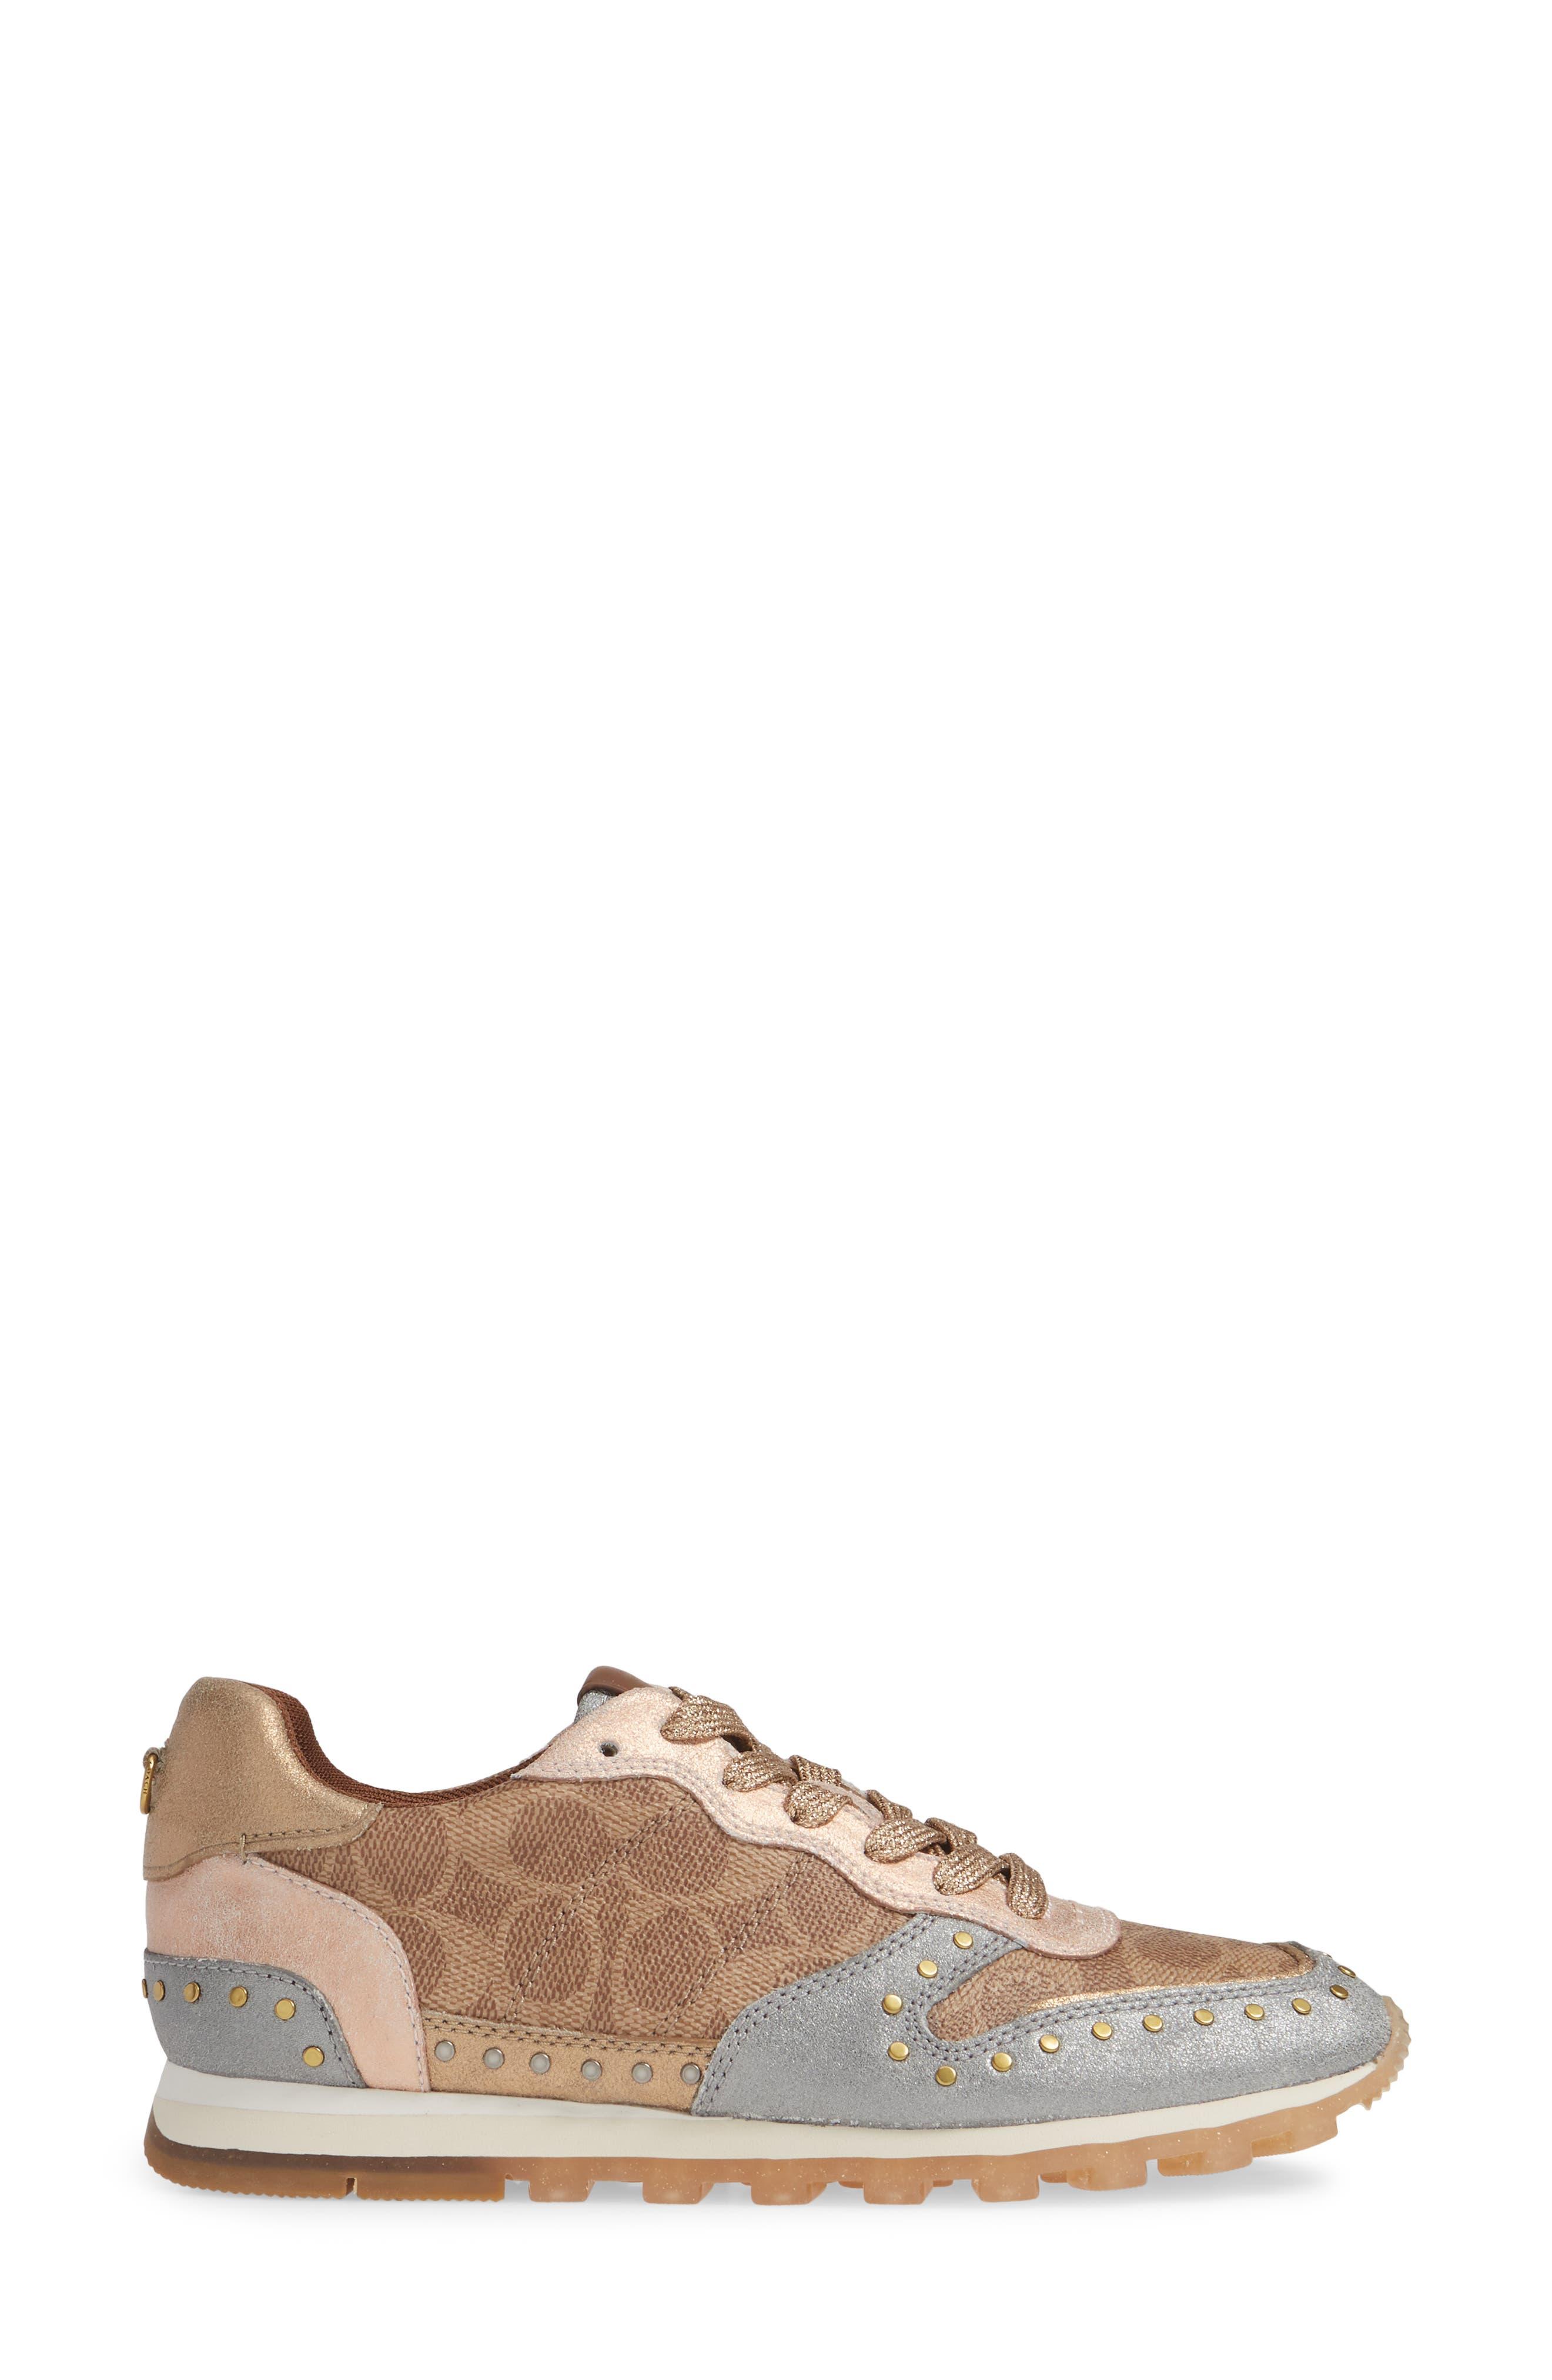 COACH, C118 Studded Sneaker, Alternate thumbnail 3, color, TAN/ GOLD MULTI